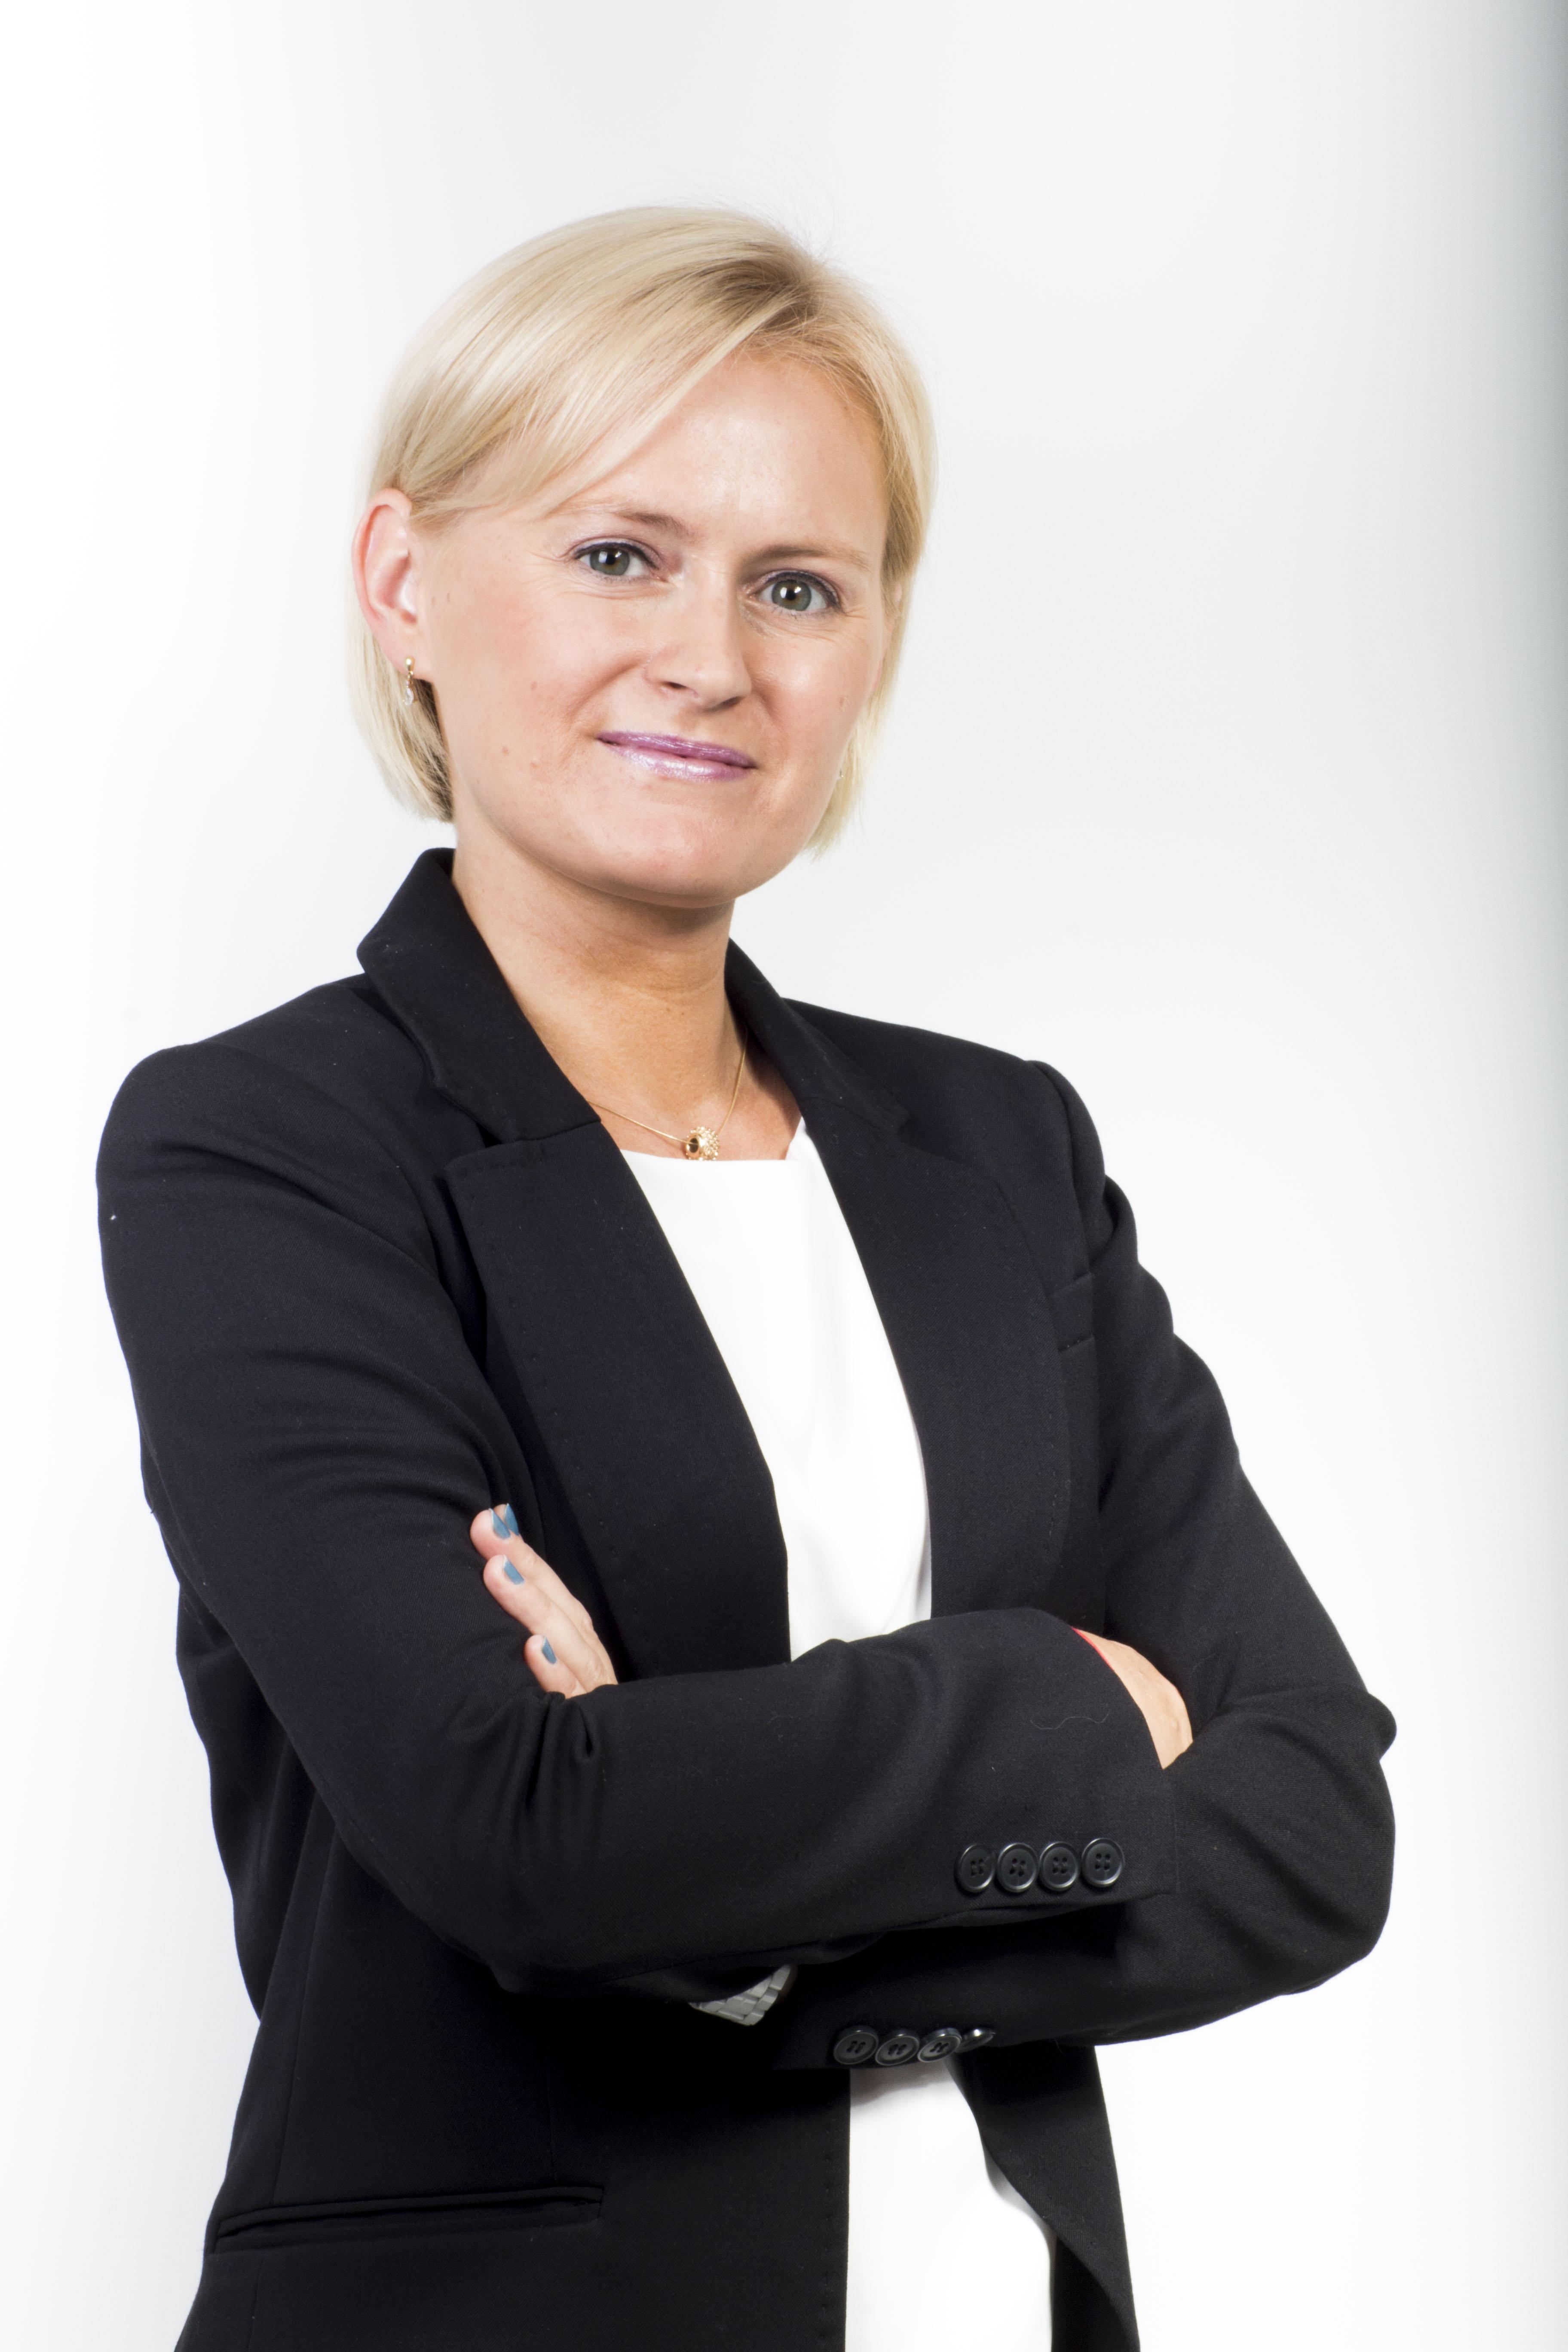 Karolina Beyer